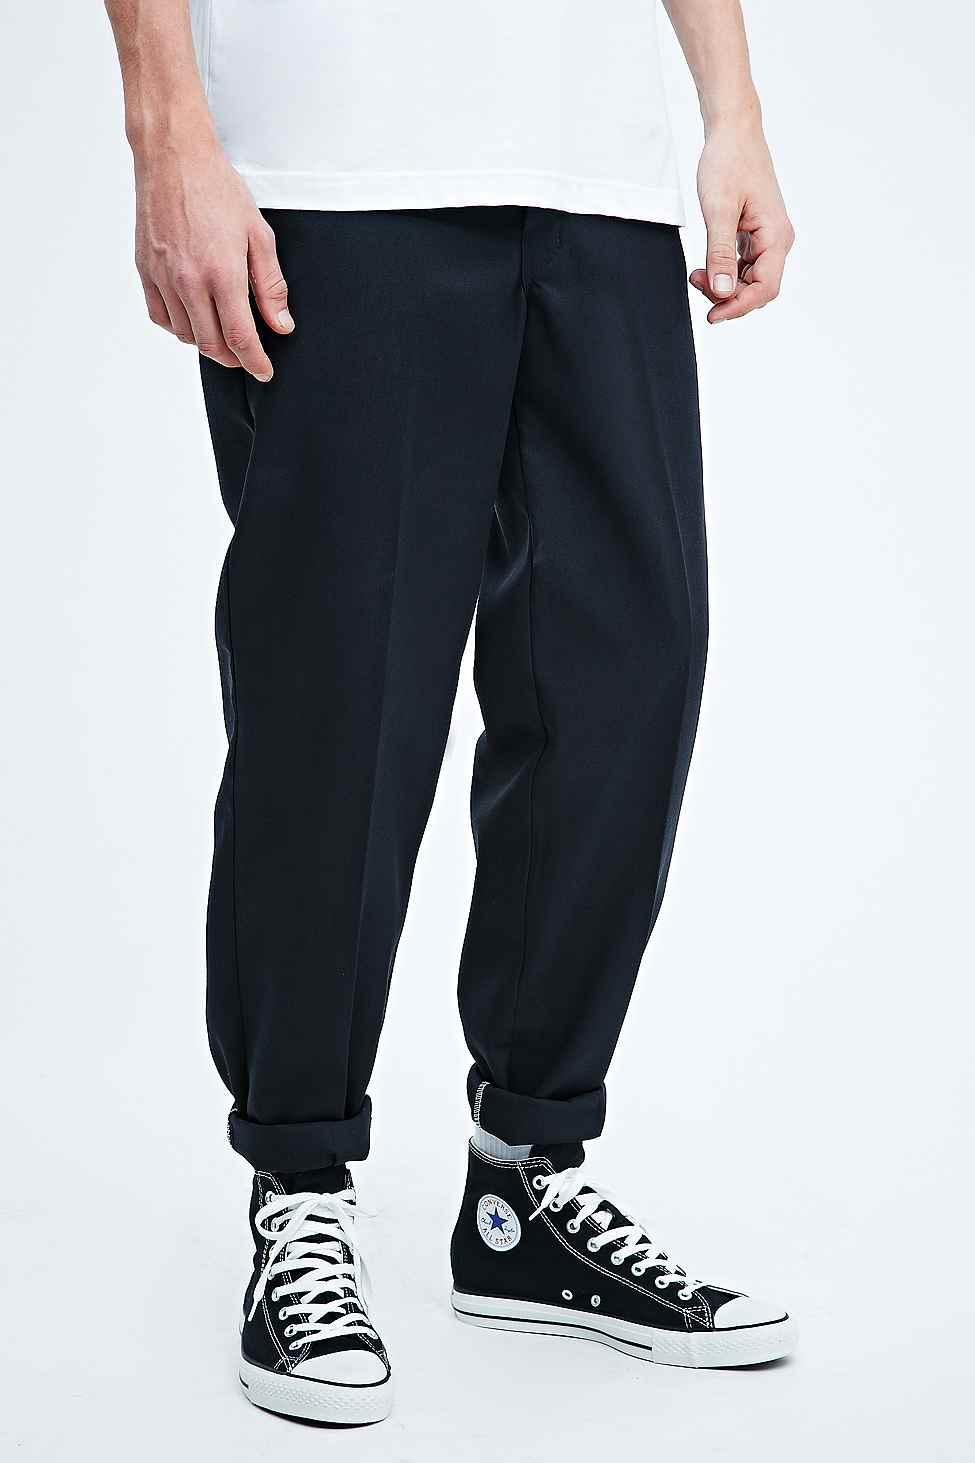 Dickies 873 Slim Straight Work Trousers In Black in Black for Men - Lyst d57de2b9a